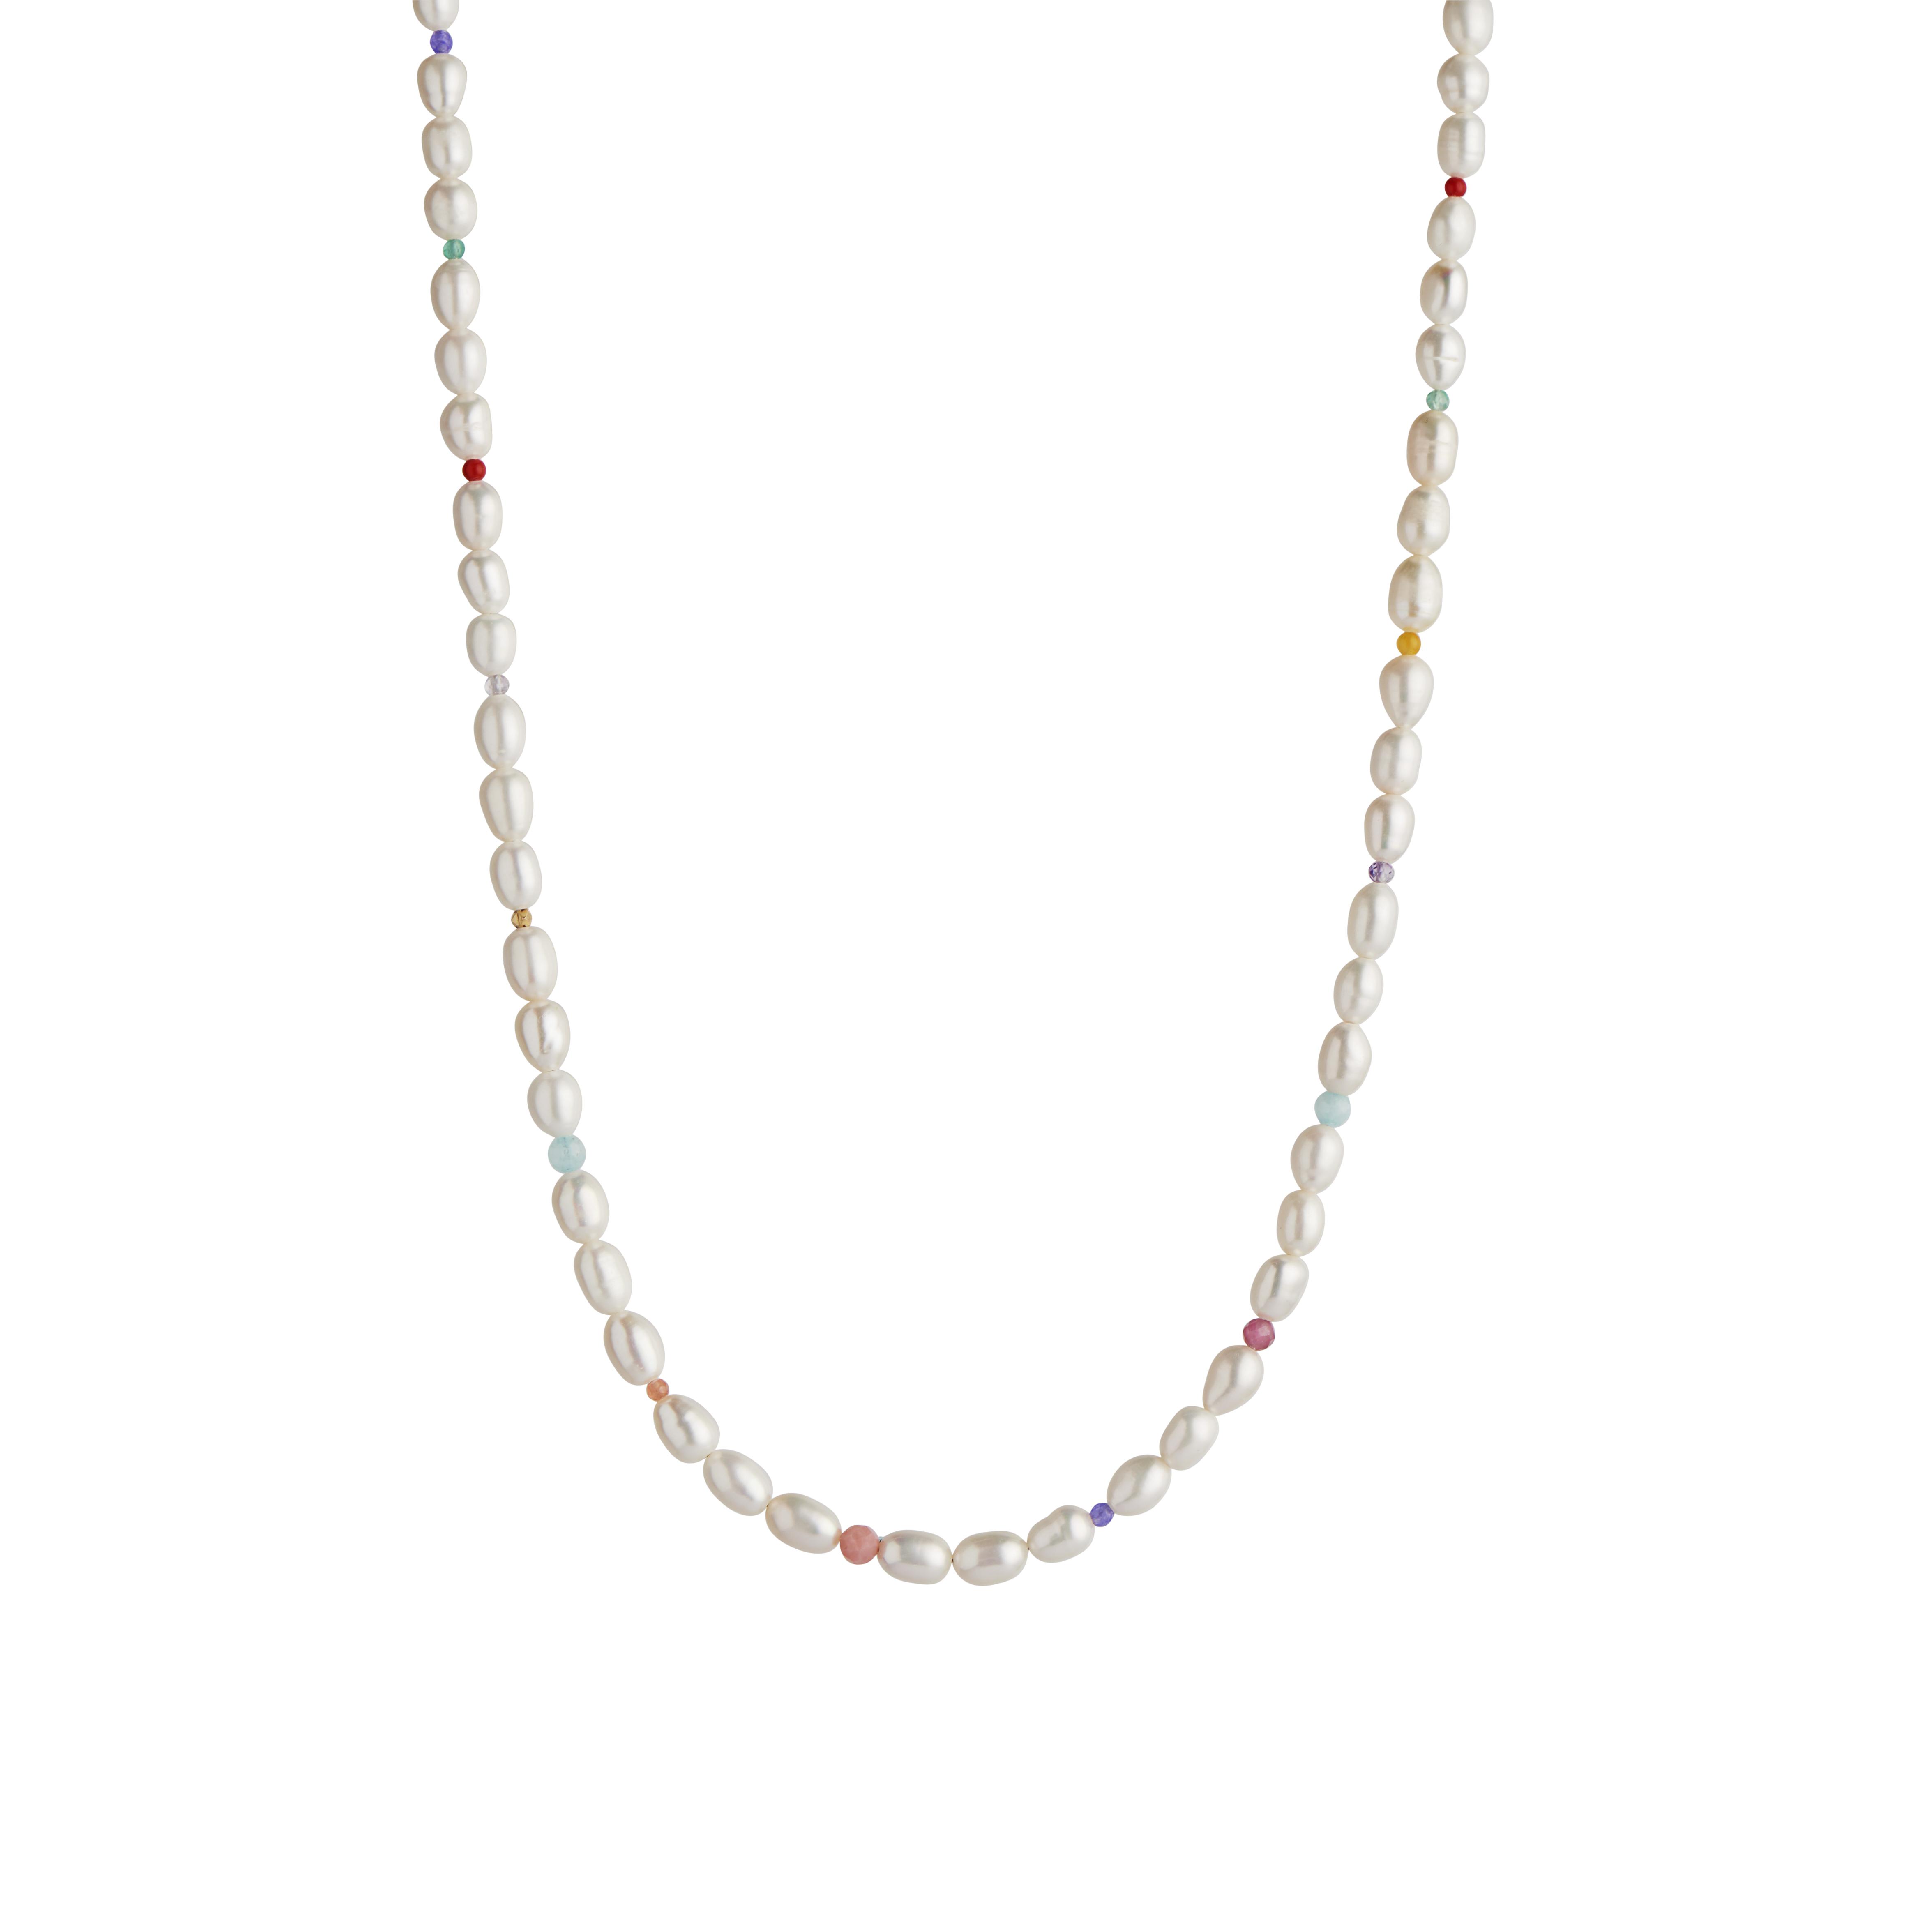 Stine A hvid Pearls and Candy Stones halskæde